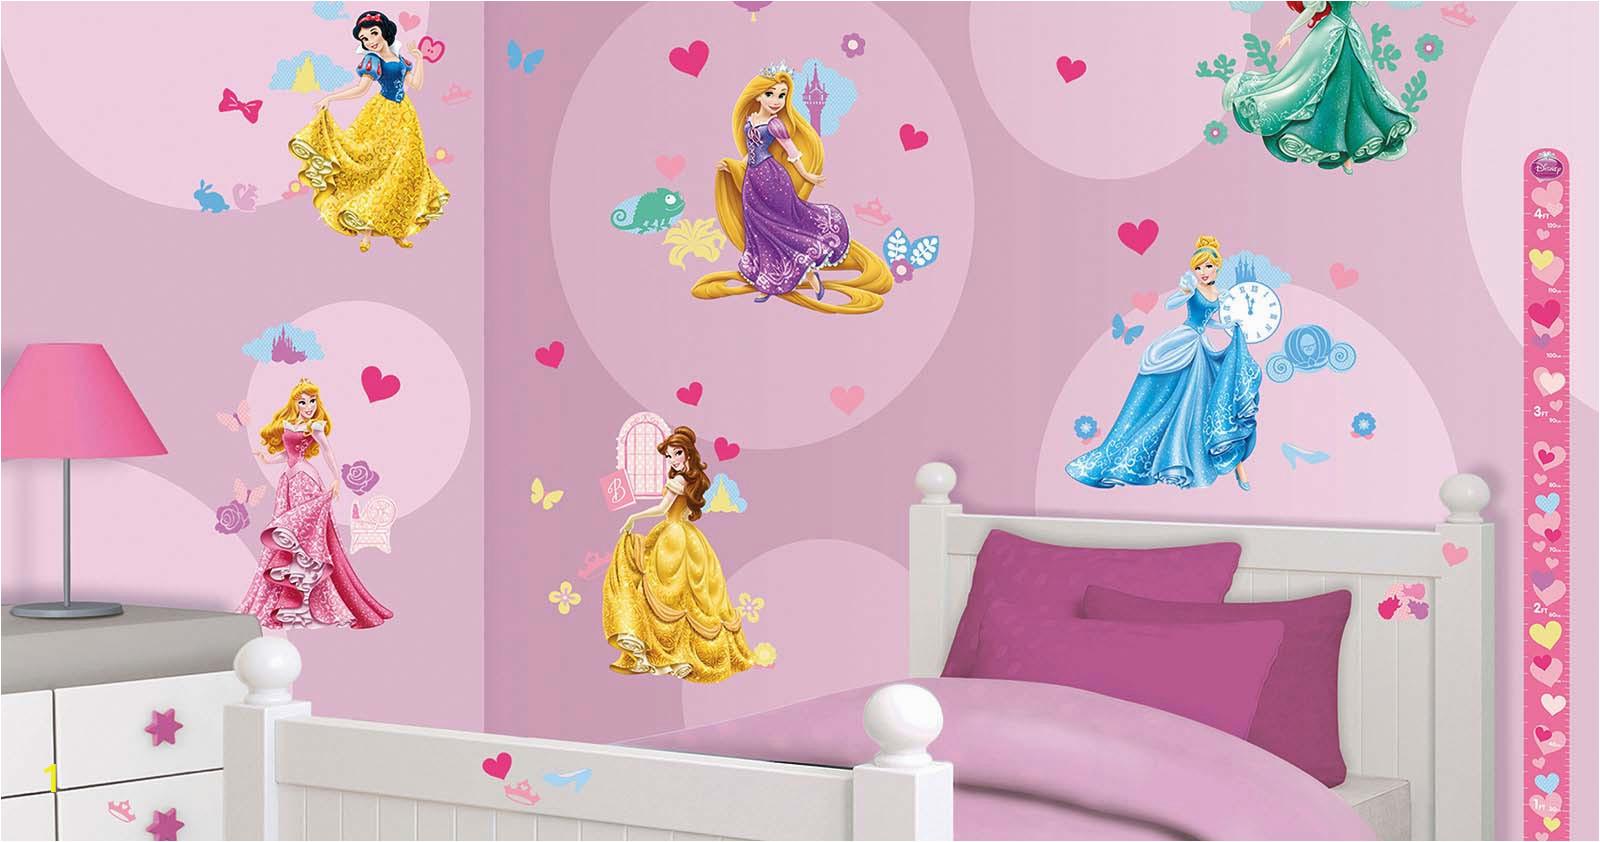 Wandtattoo Disney Princess Details WT daB2N9rqEebxUe